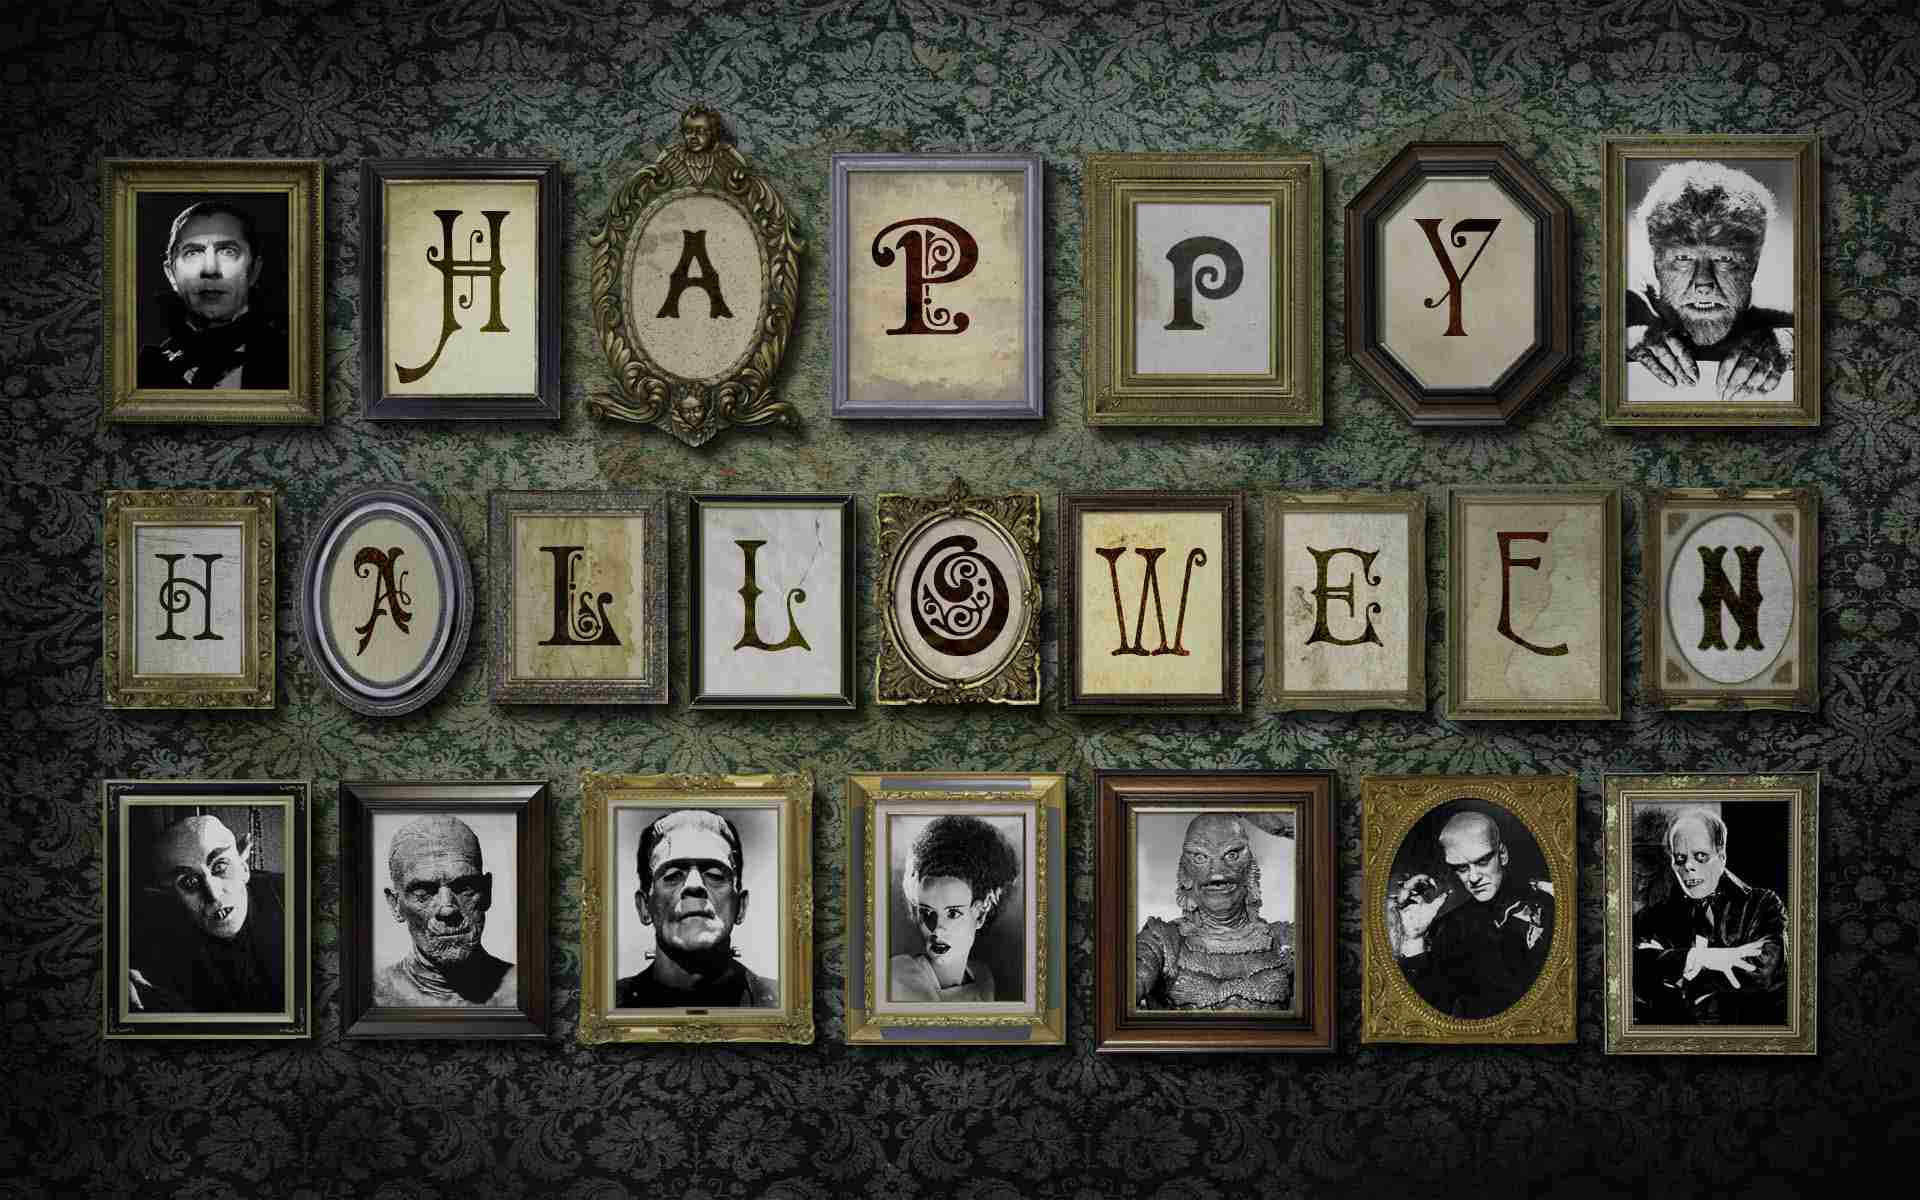 ws Halloween Wall 1920x1200 596139bd5f9b583f180c6e1a